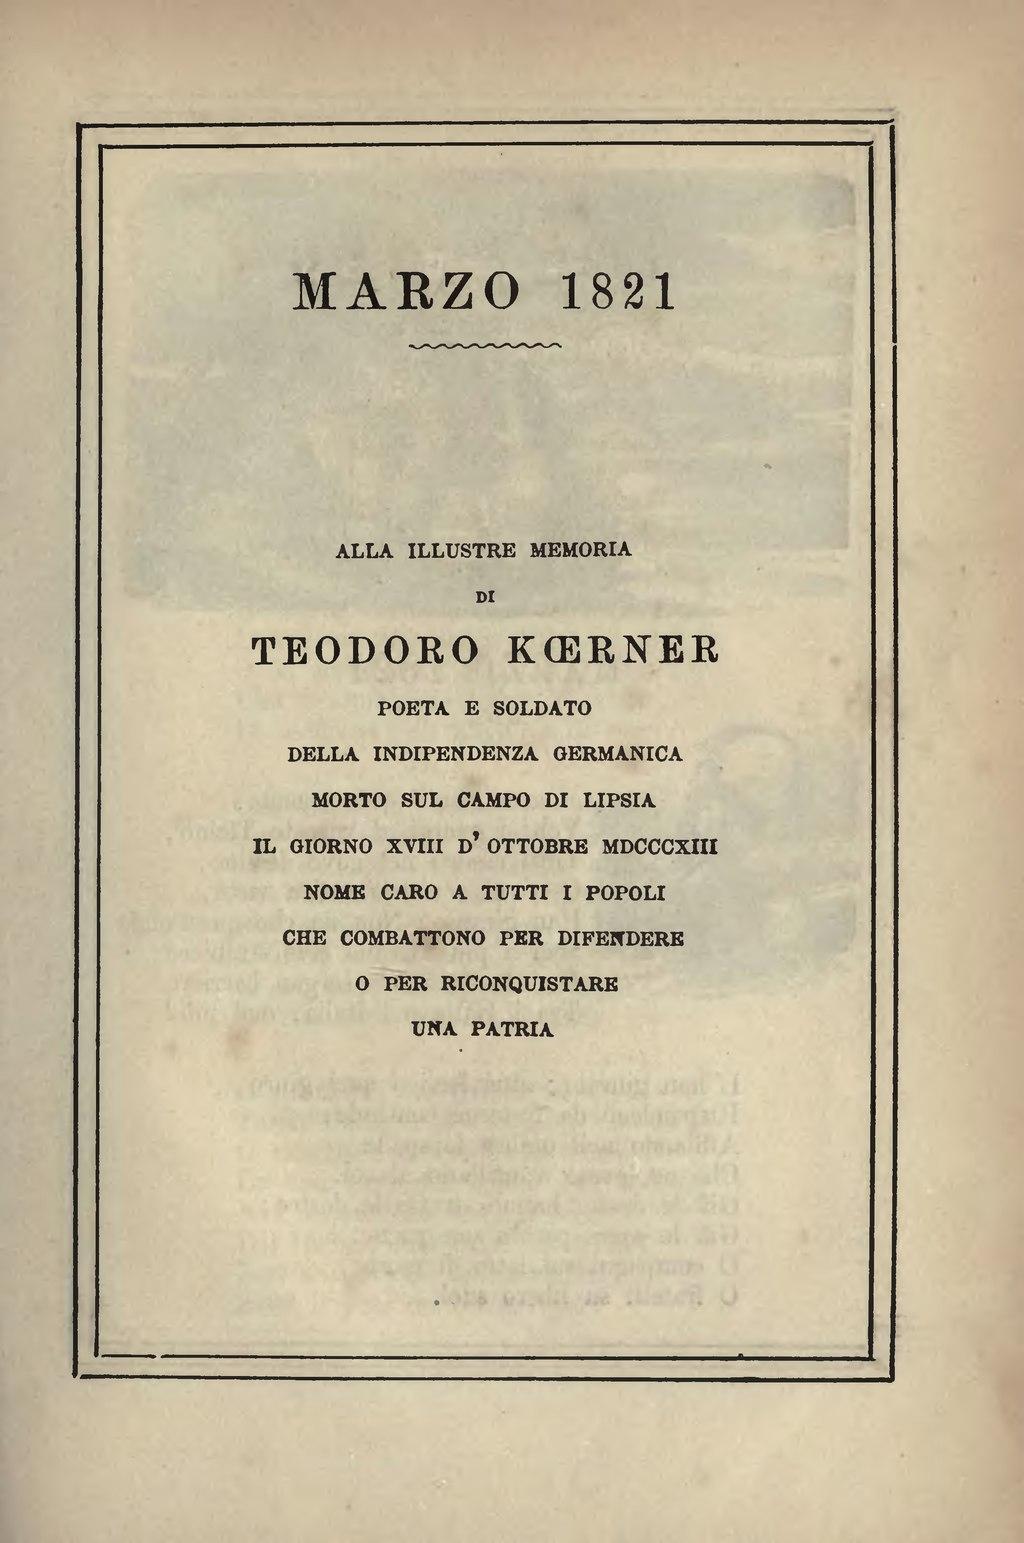 Pagina opere varie manzoni djvu 699 wikisource - Testo i giardini di marzo ...